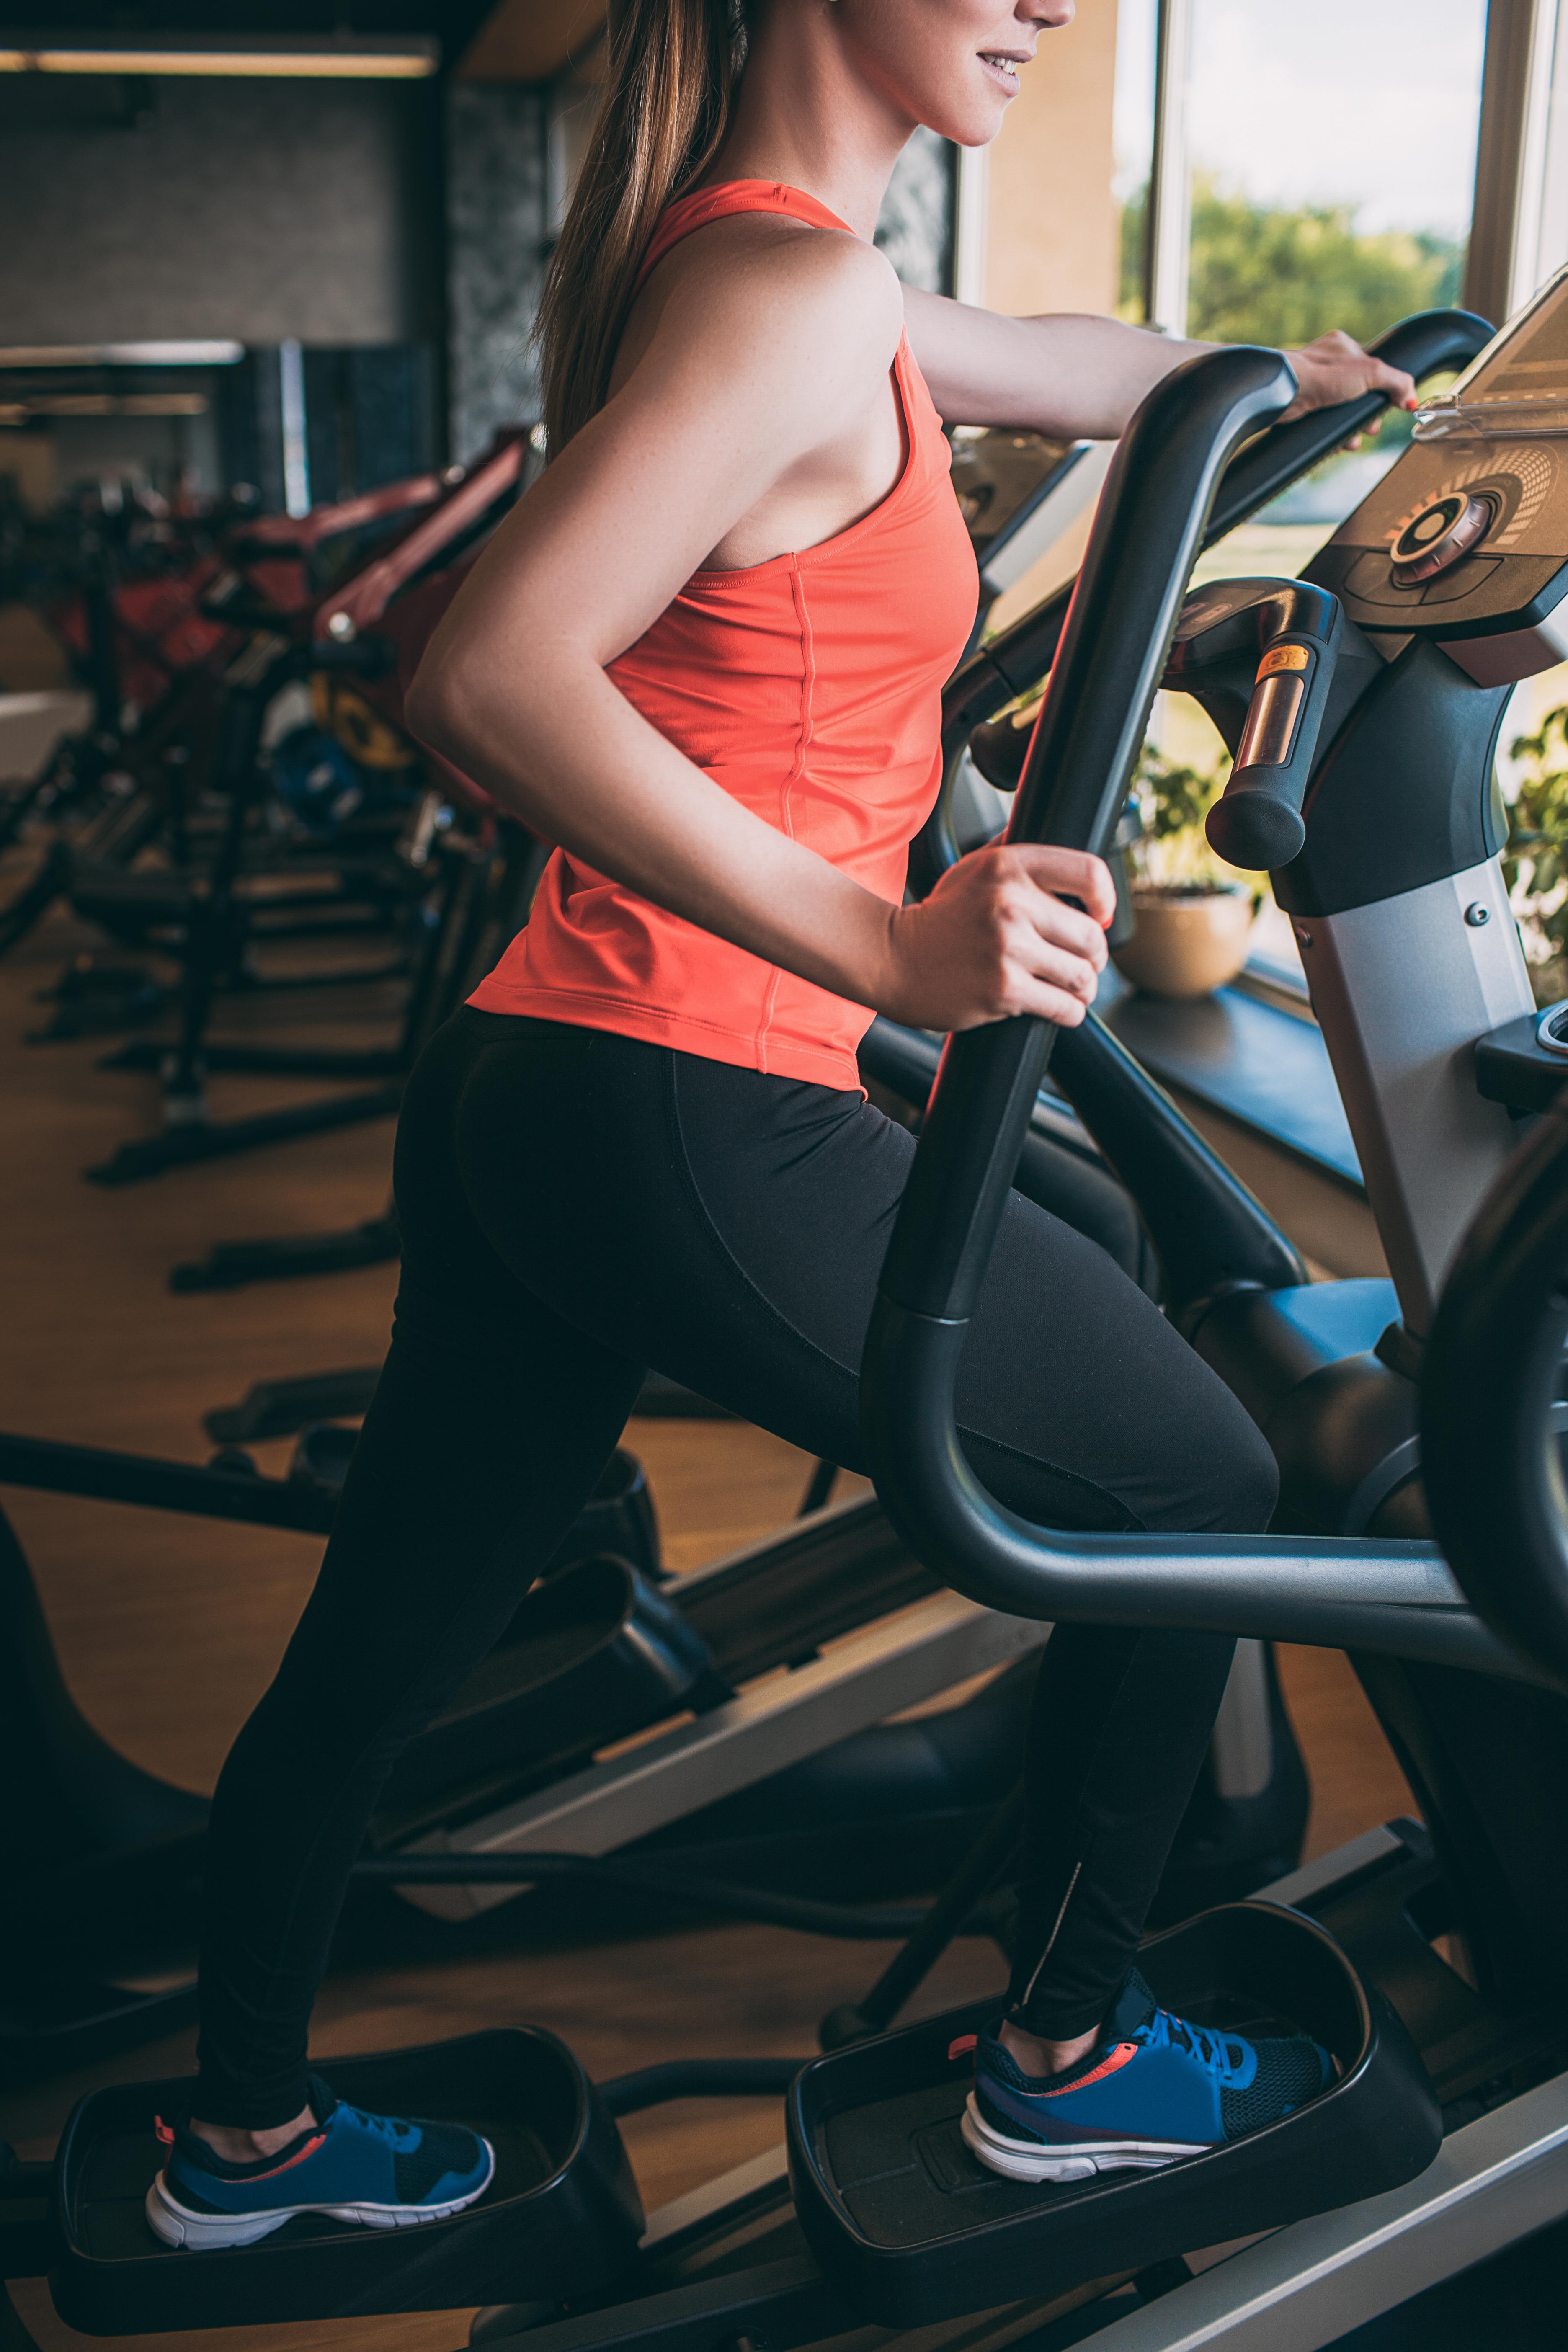 Sport girl run orbitrek gym body fitness concept.jpg Hard cardio workout.jpg All for the    of achie